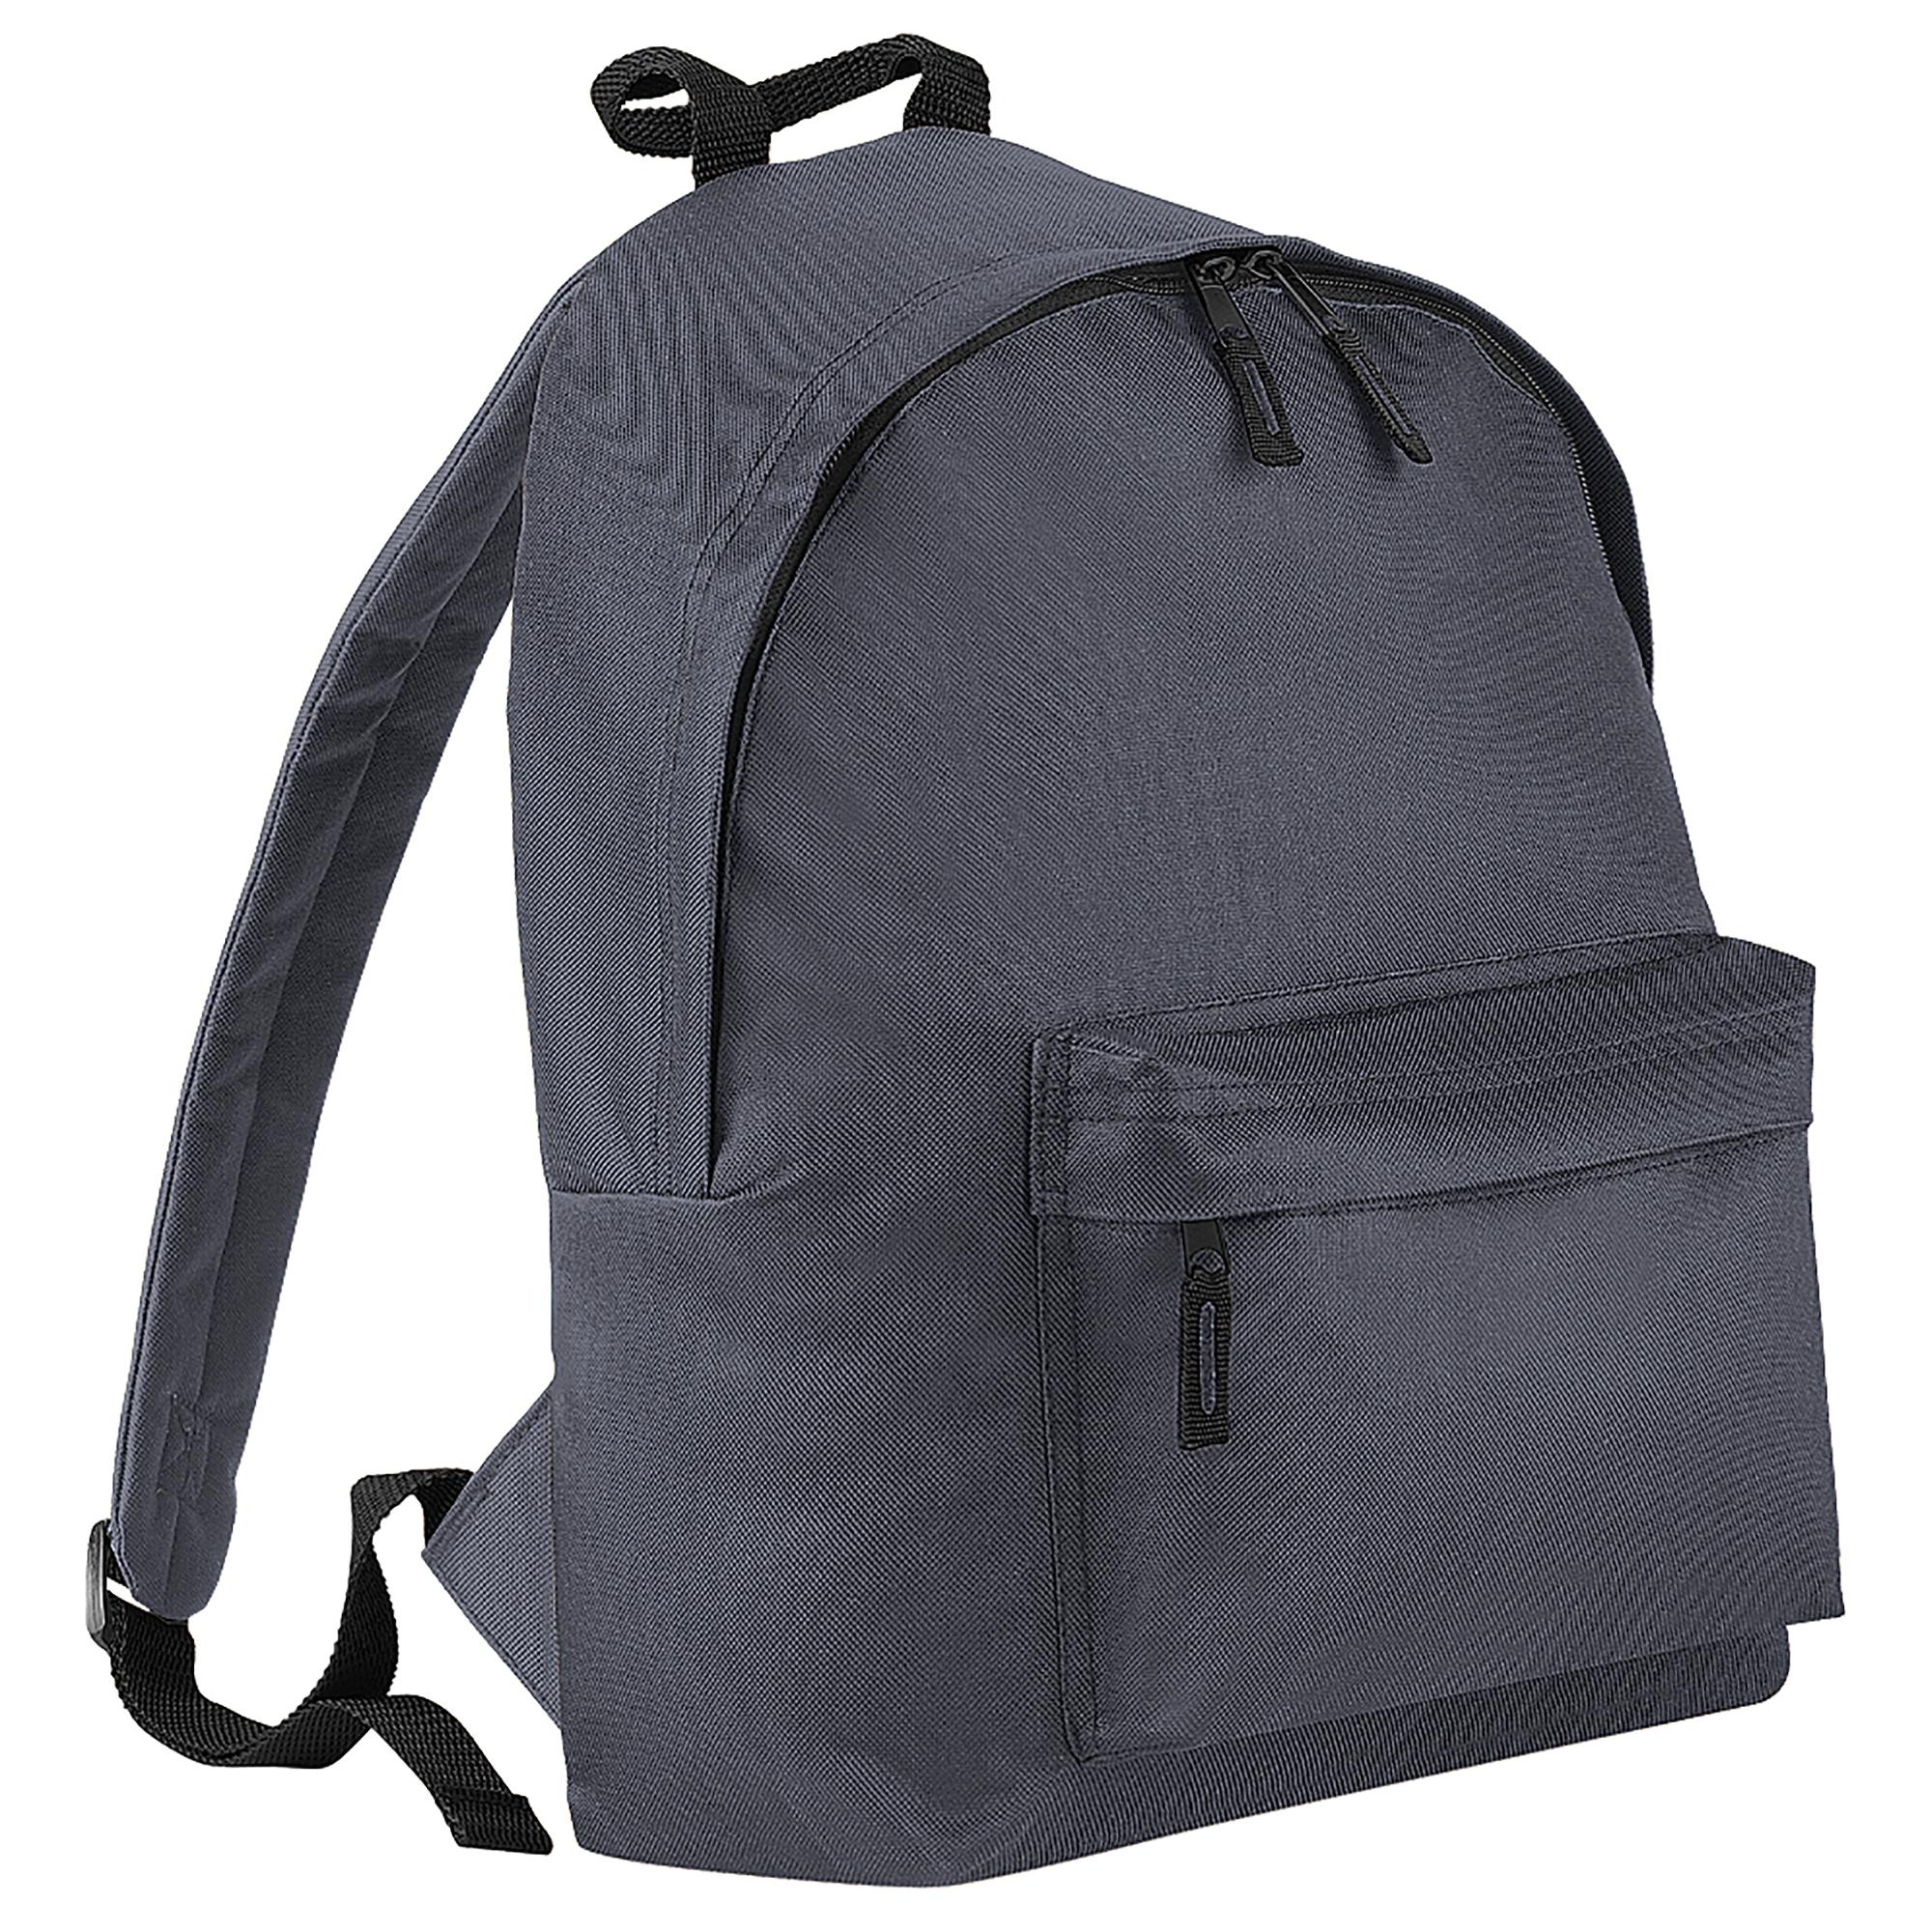 Bagbase Fashion Backpack Rucksack 18 Litres BC1300